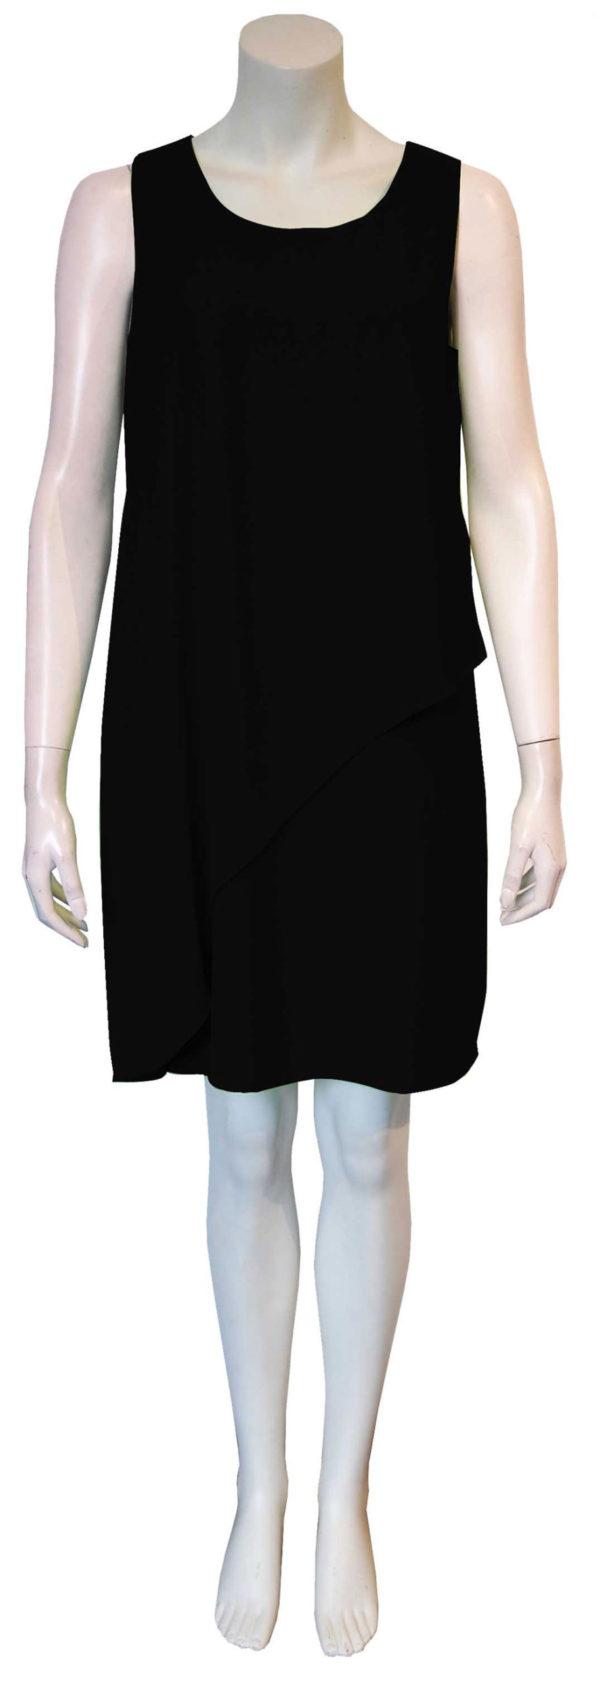 black sheath dress- front